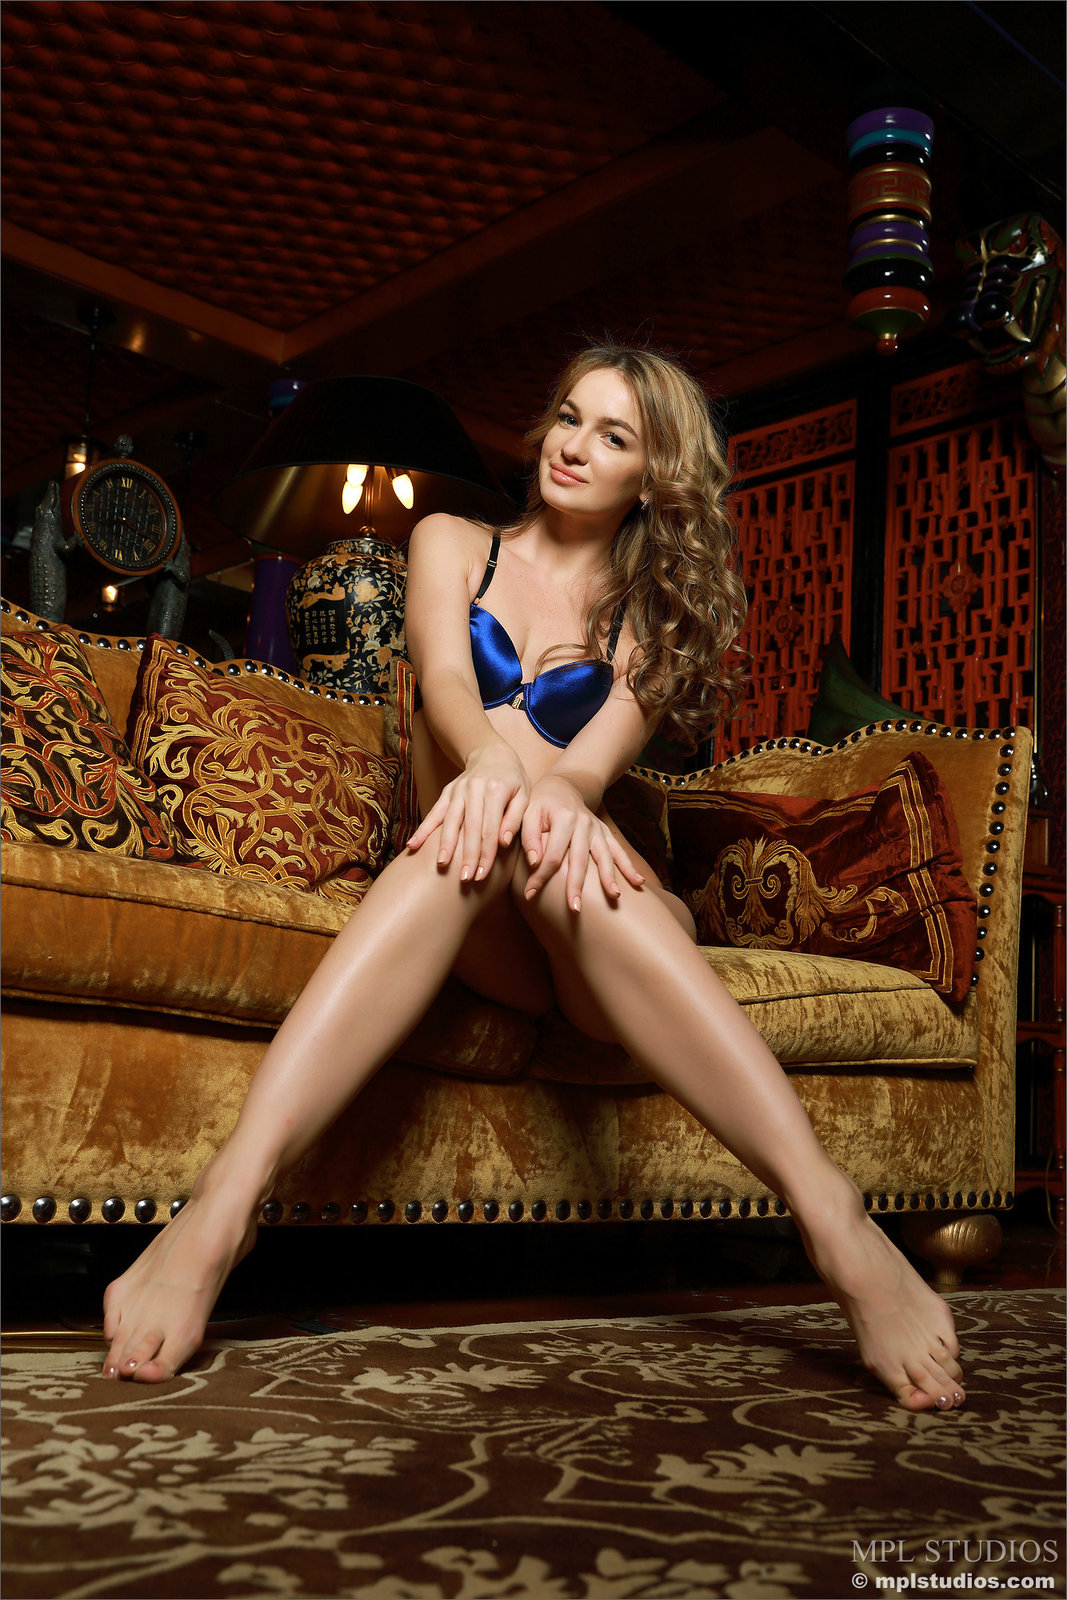 Zdjęcie porno - 07 1 - Słodkie nóżki i ładna buźka